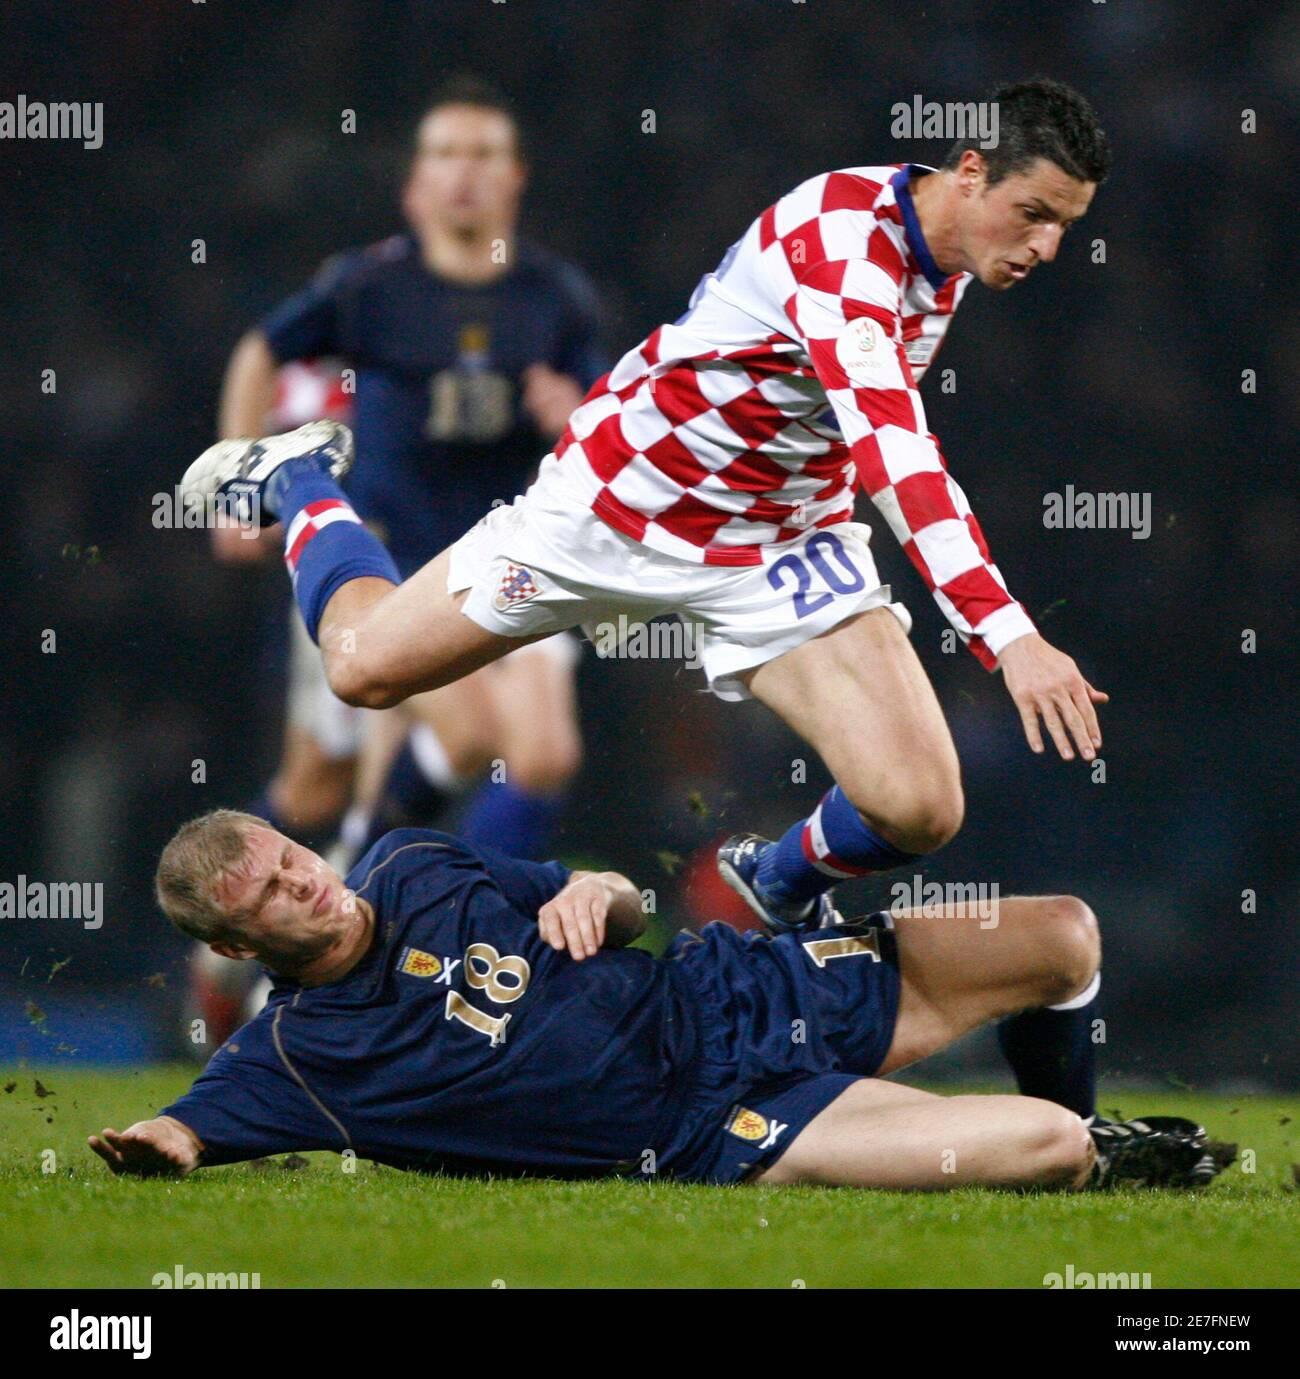 Scotland's James McEvely (18) tackles Croatia's Igor Budan (20) during their international soccer match at Hampden Park stadium in Glasgow, Scotland March 26, 2008.  REUTERS/David Moir (BRITAIN) Banque D'Images